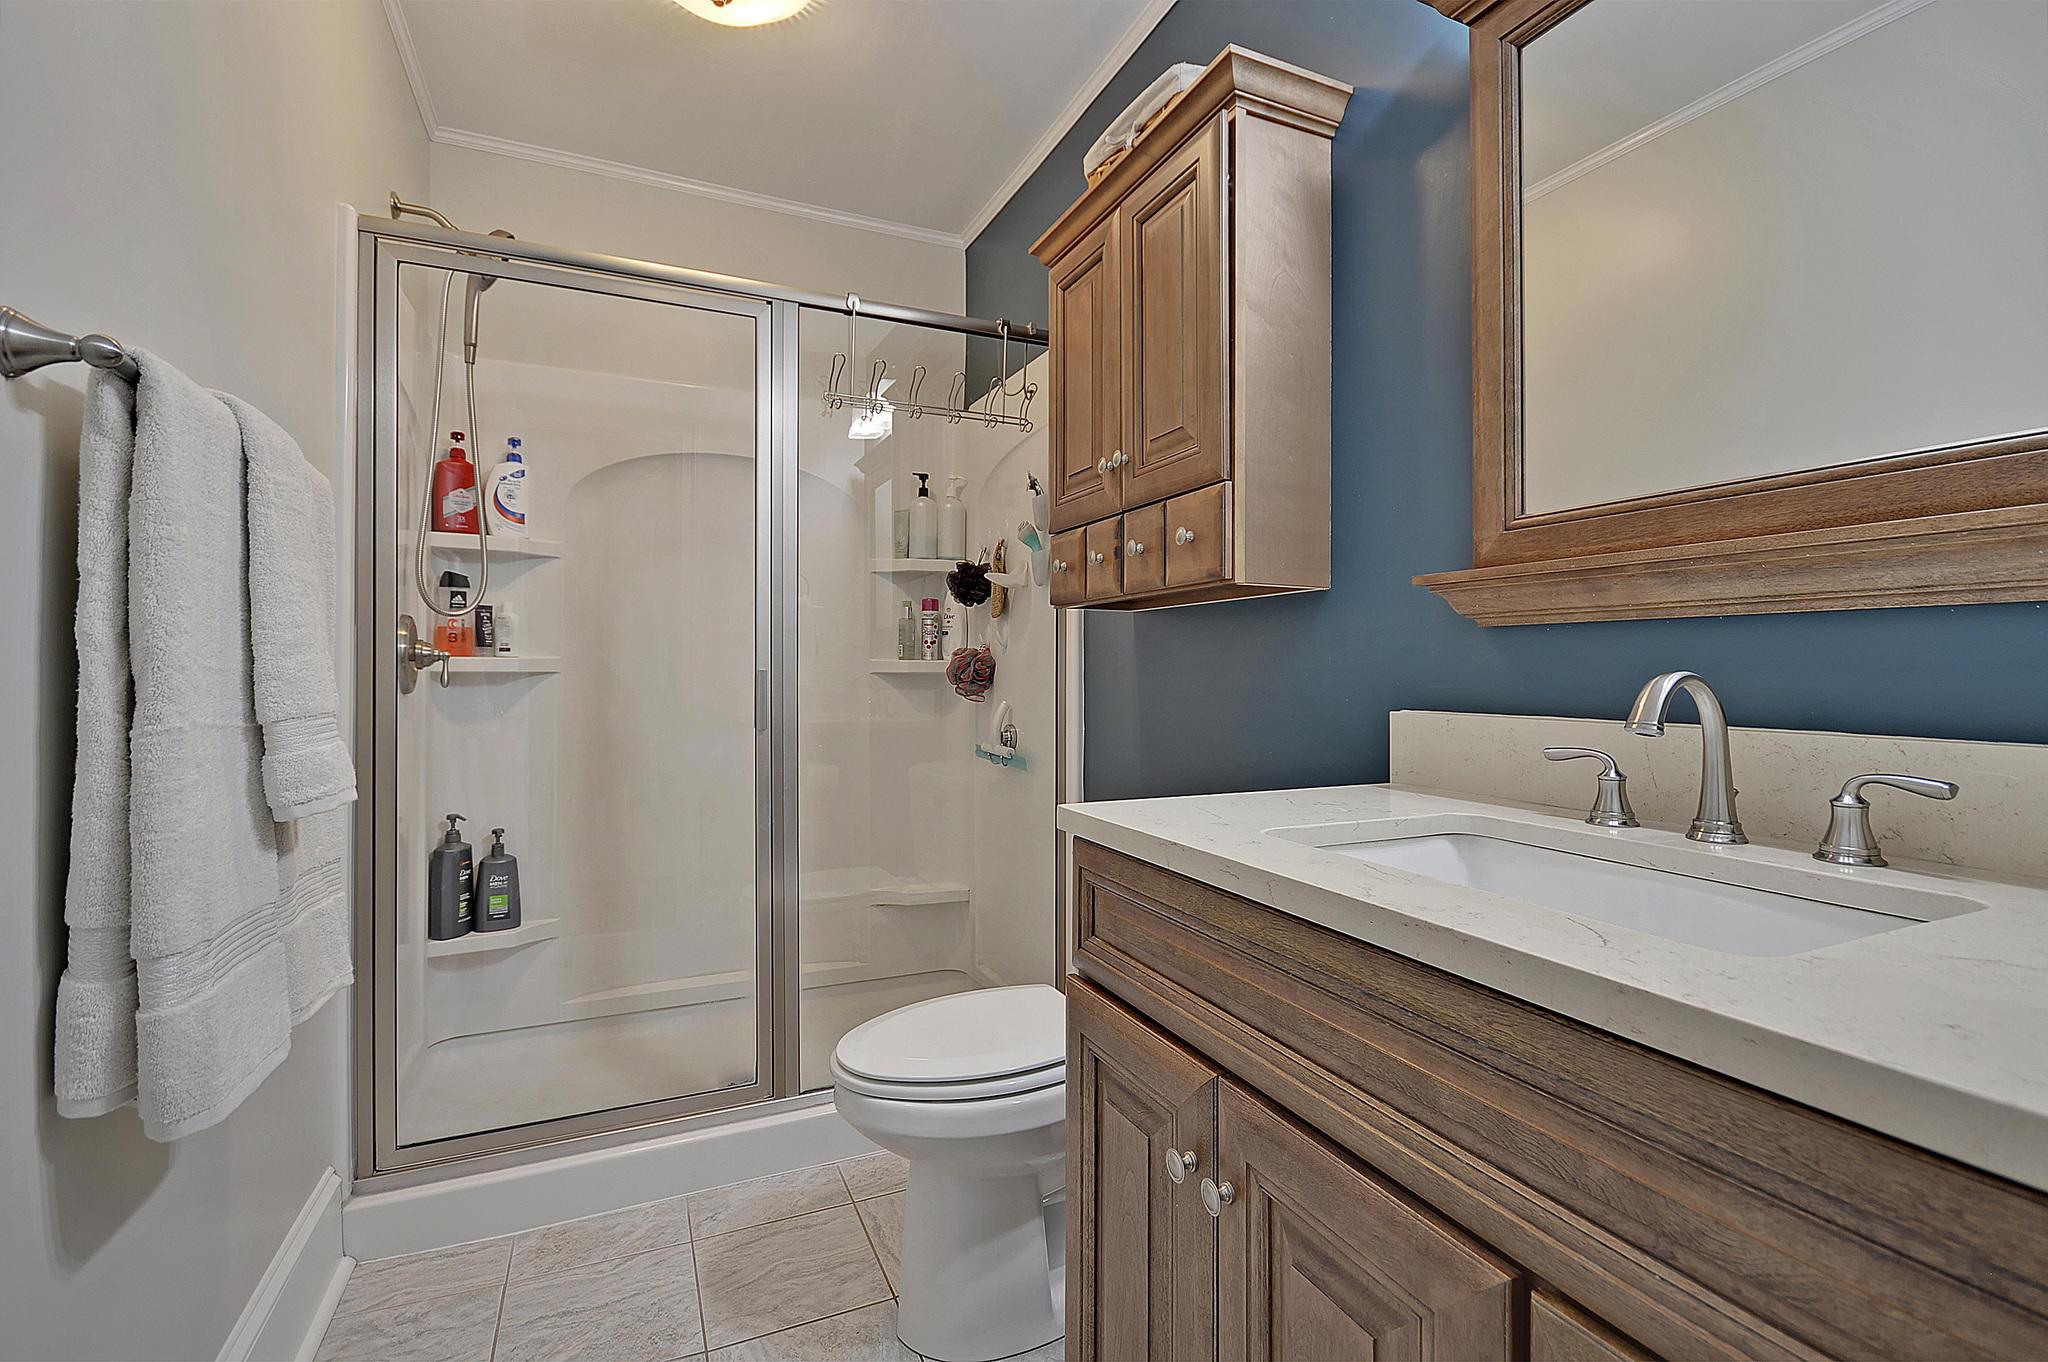 Edgewater Park Homes For Sale - 1356 Emory, Charleston, SC - 34